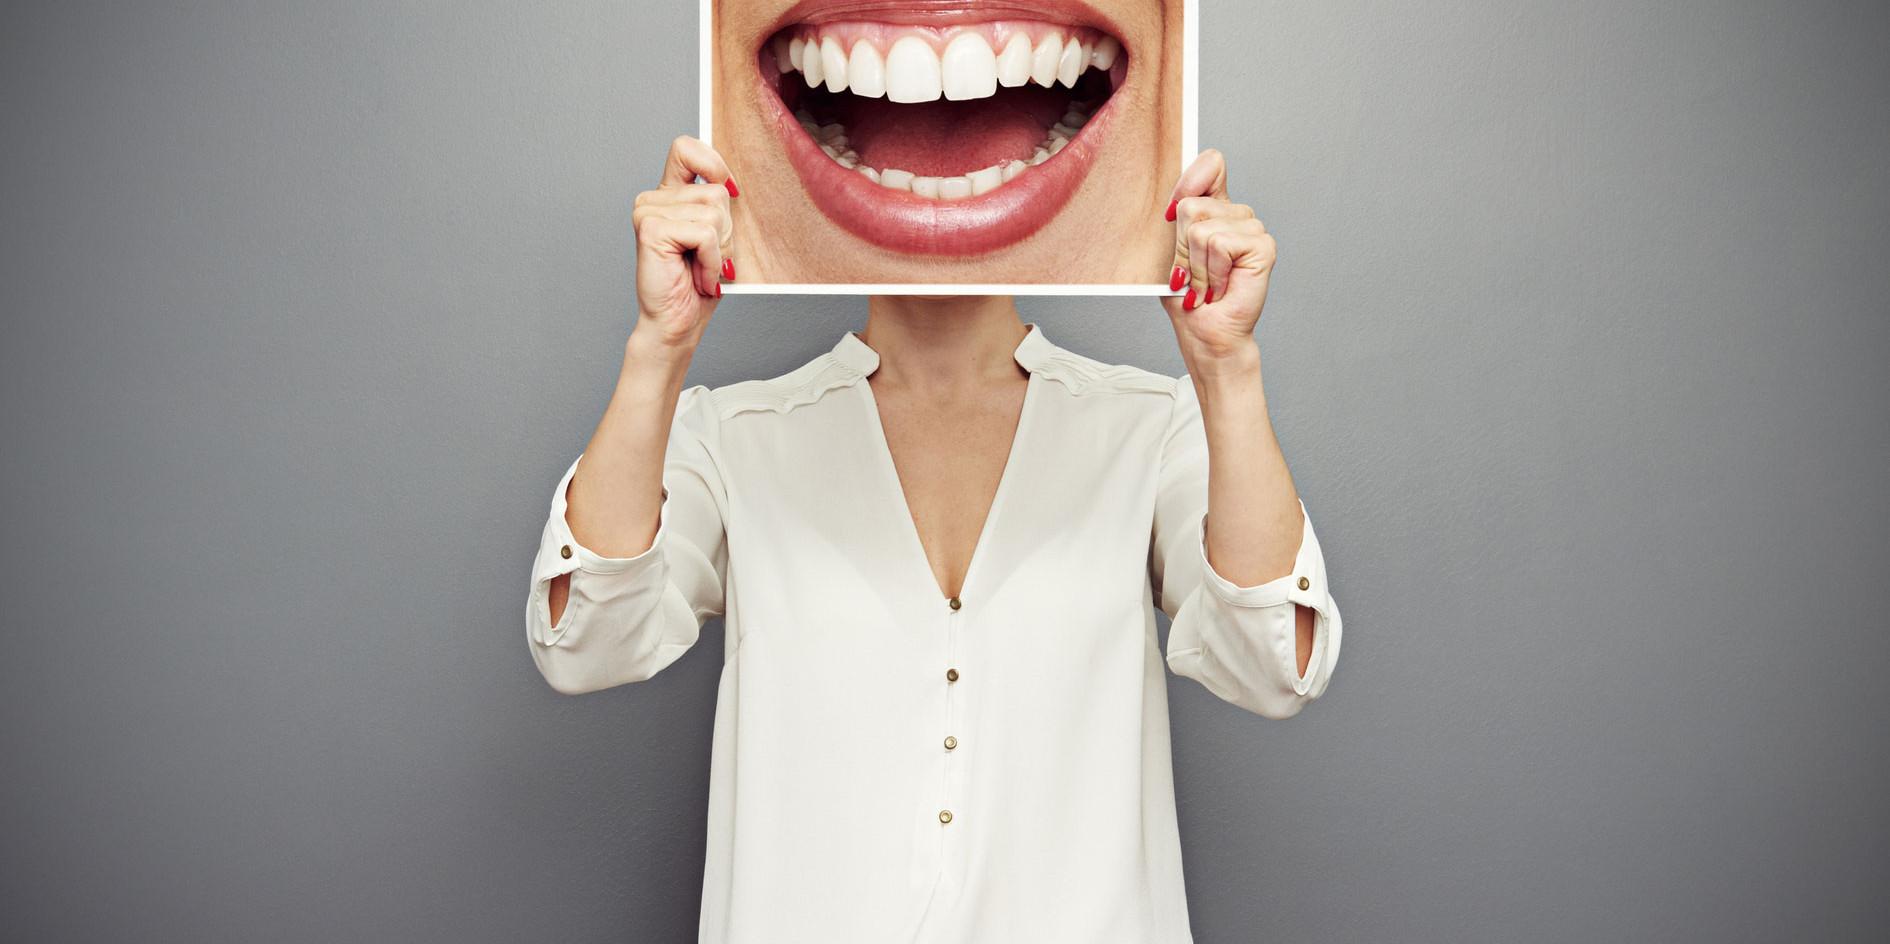 Gold Dental Clinic